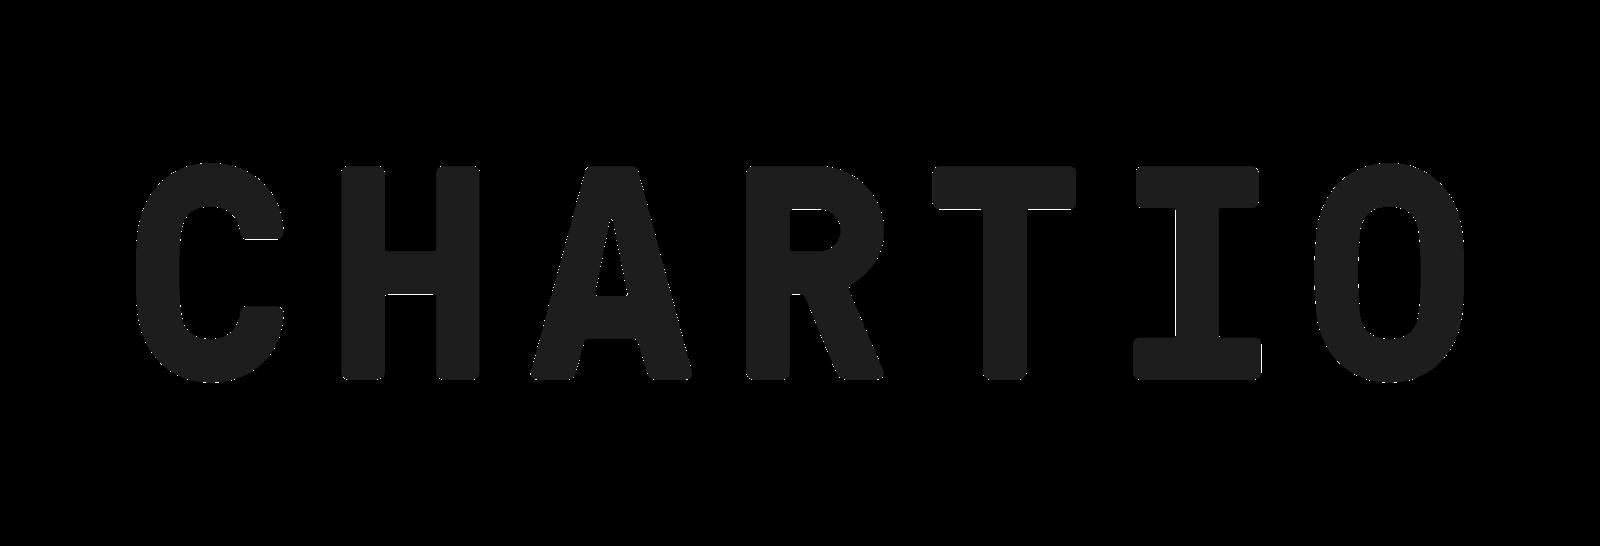 marketing analytics platform - chartio